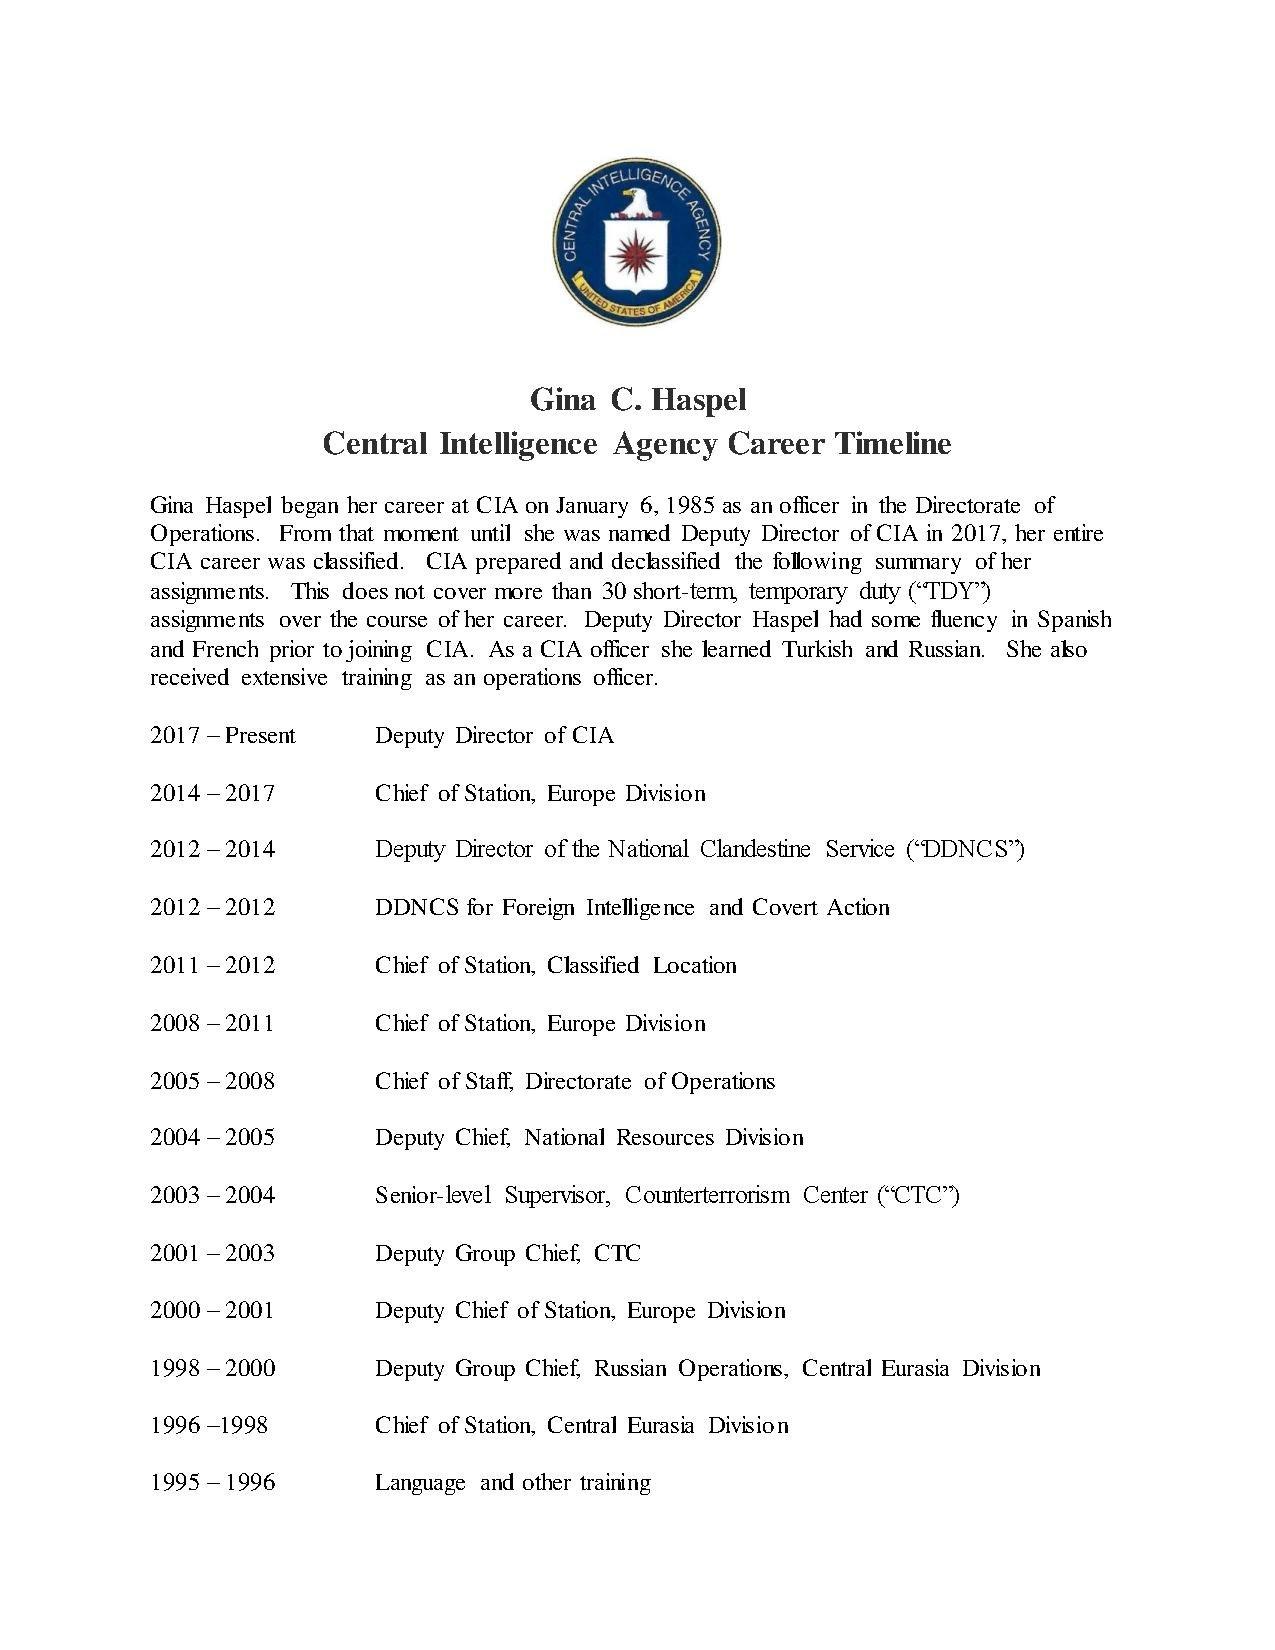 ملف:Gina C  Haspel - CIA Career Timeline, 1 May 2018 pdf